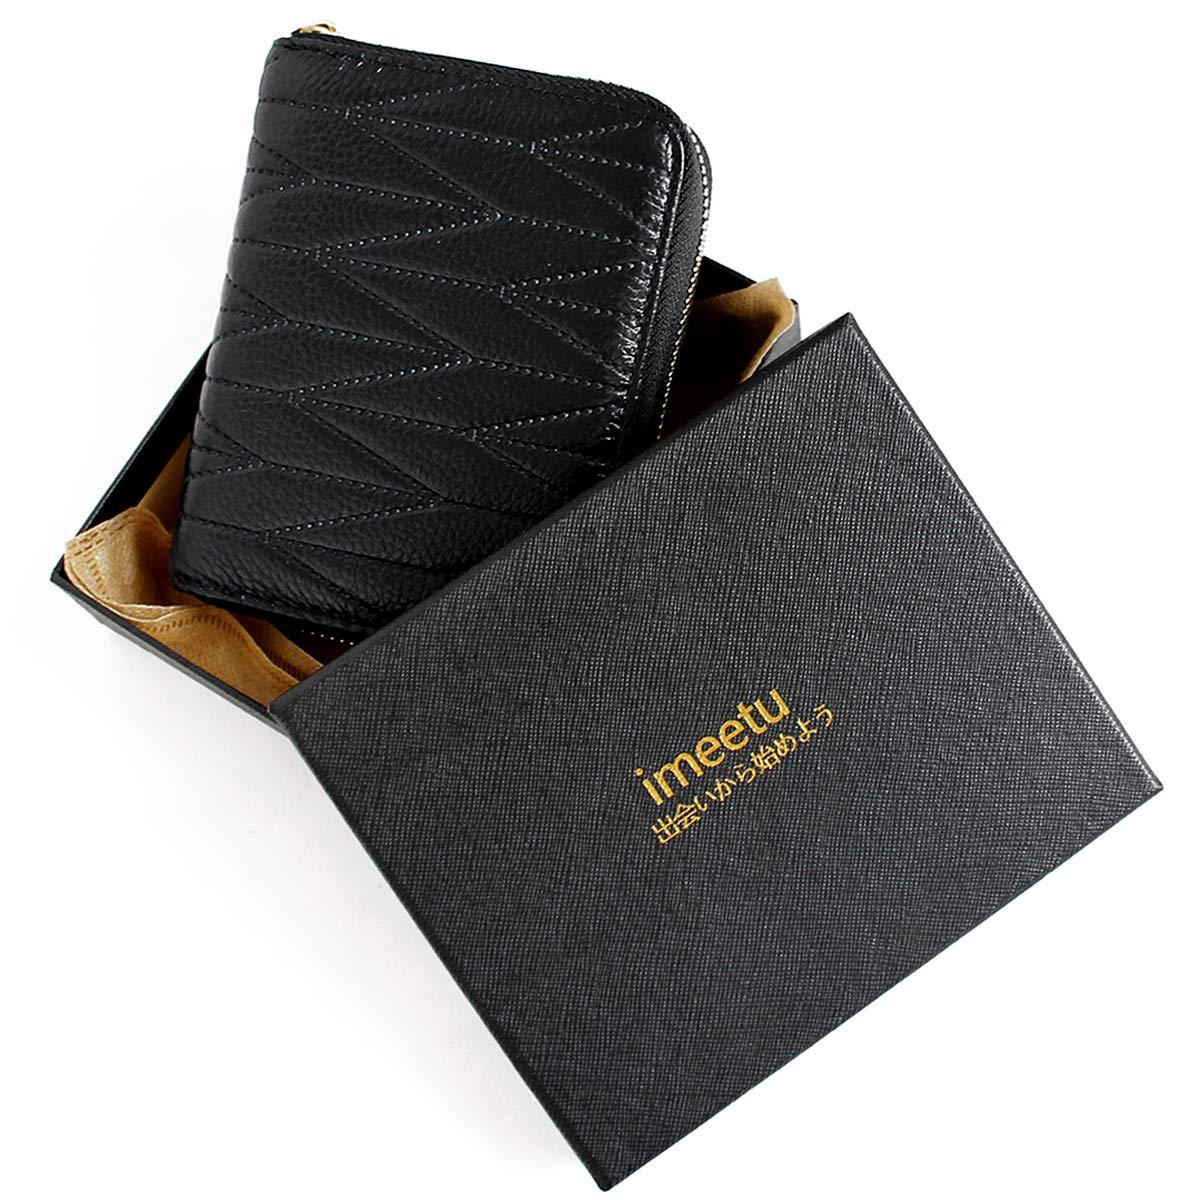 imeetu Women/men RFID Blocking Leather Credit Card Holder case Accordion Wallet 24 Slots Purses with Zipper Pocket(Wine Red) by imeetu (Image #8)